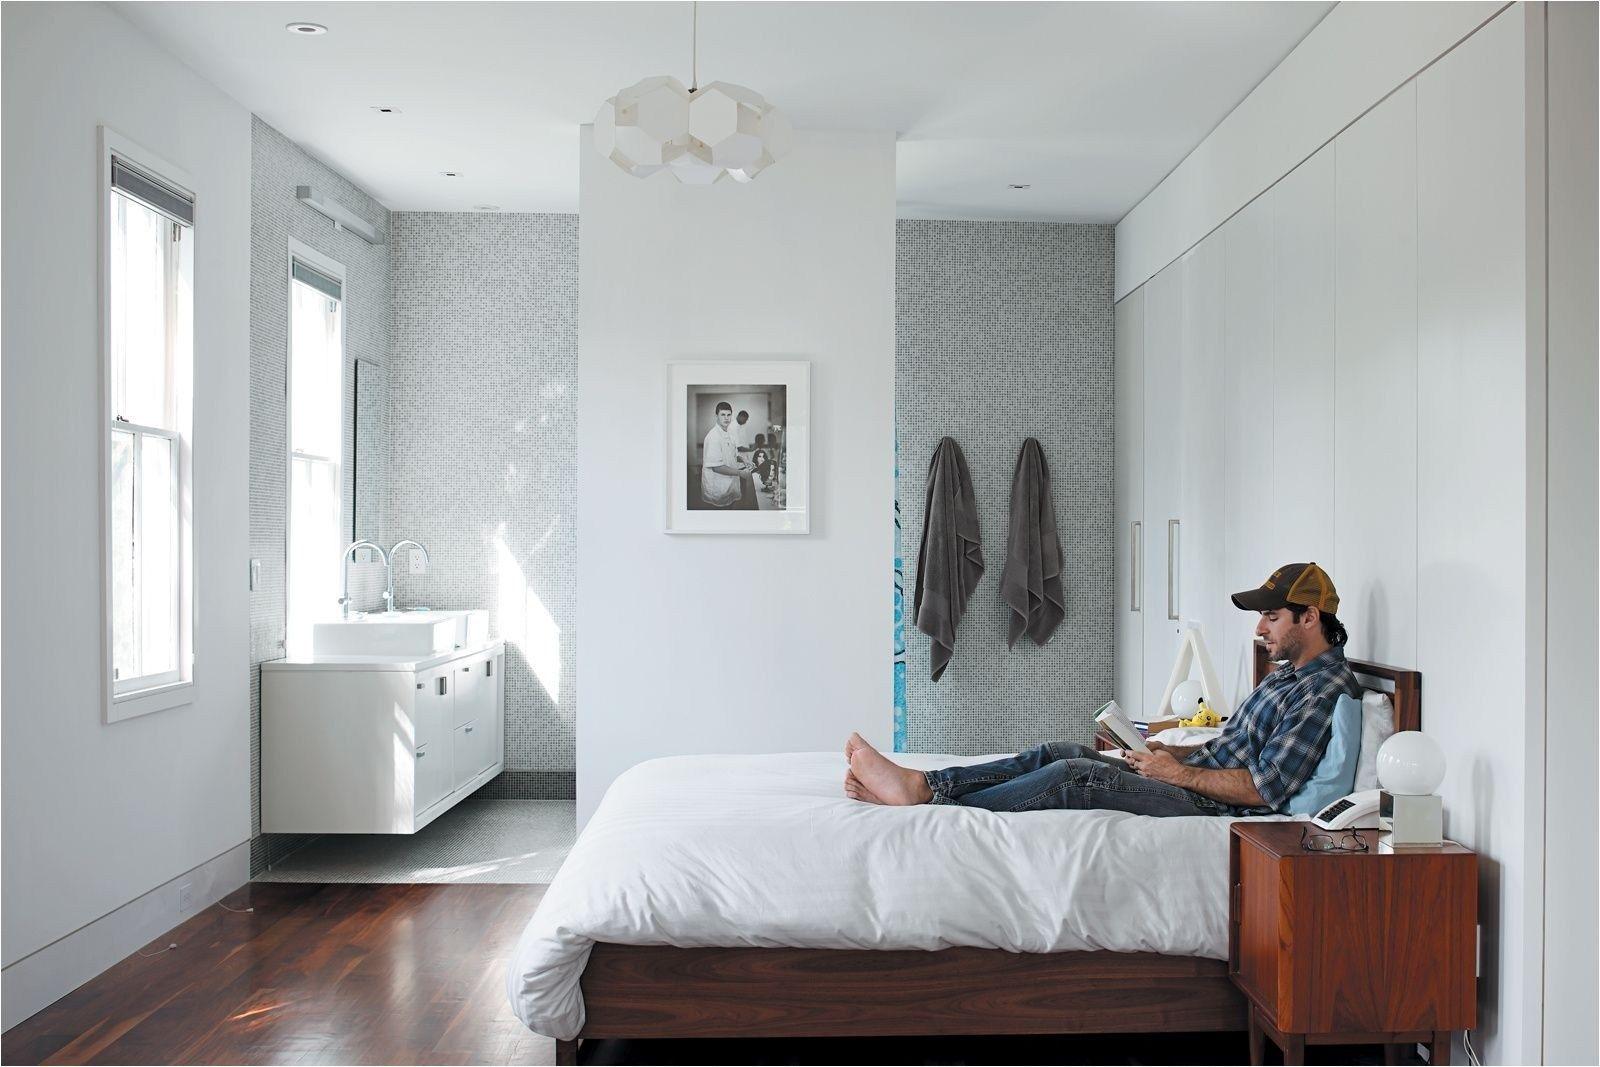 Open Bedroom Bathroom Design 33 Craft And Home Ideas Small Master Bedroom Open Plan Bathrooms Bedroom With Ensuite